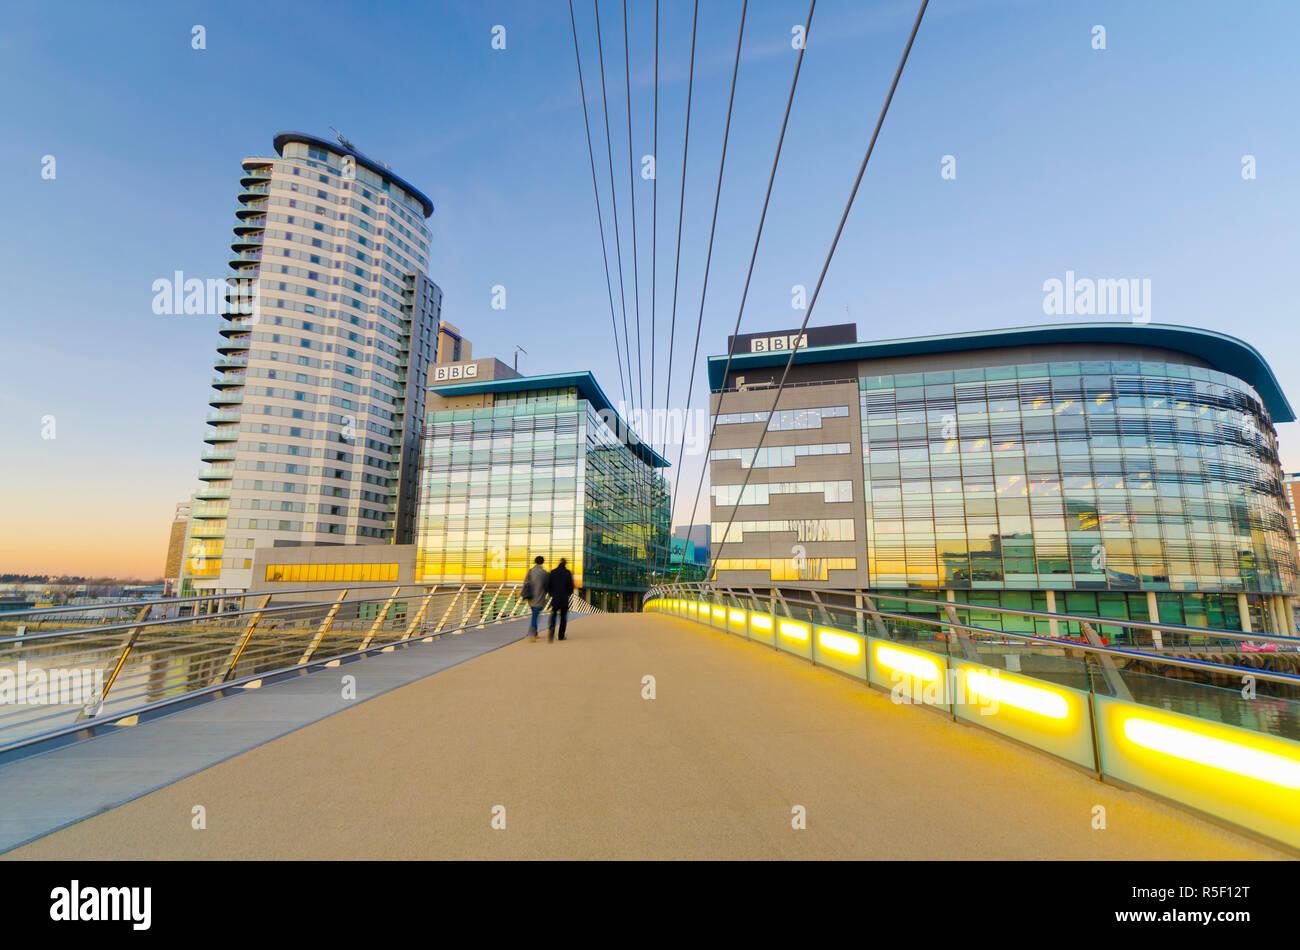 UK, England, Greater Manchester, Salford, Salford Quays, North Bay, MediaCityUK, housing BBC, and MediaCityUK Footbridge Stock Photo